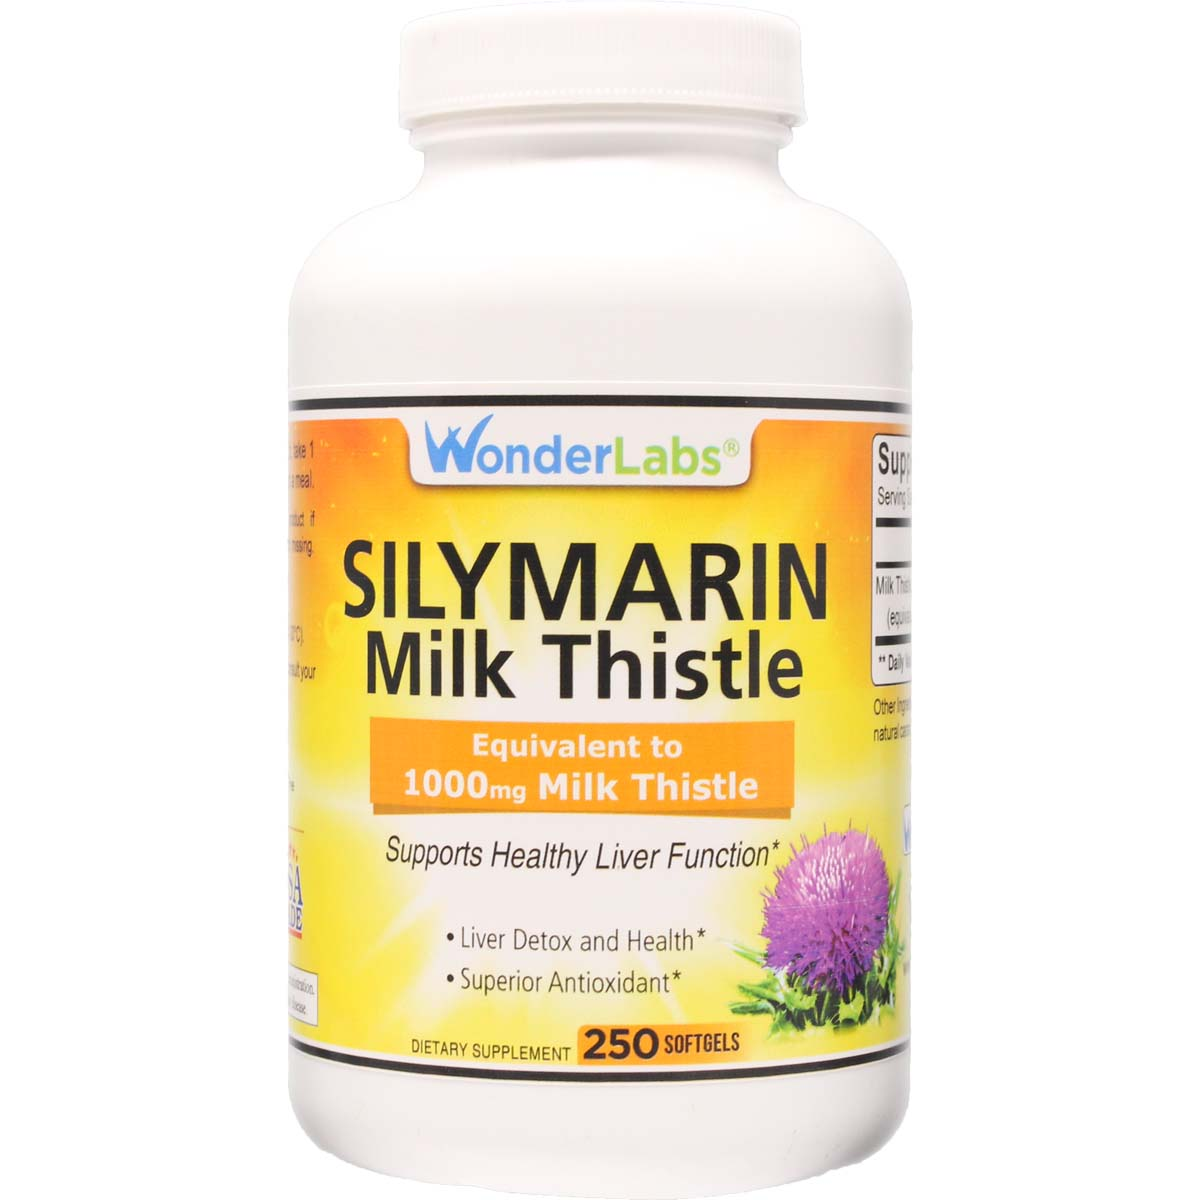 Silymarin Milk Thistle | Equivalent to 1000 mg Milk Thistle